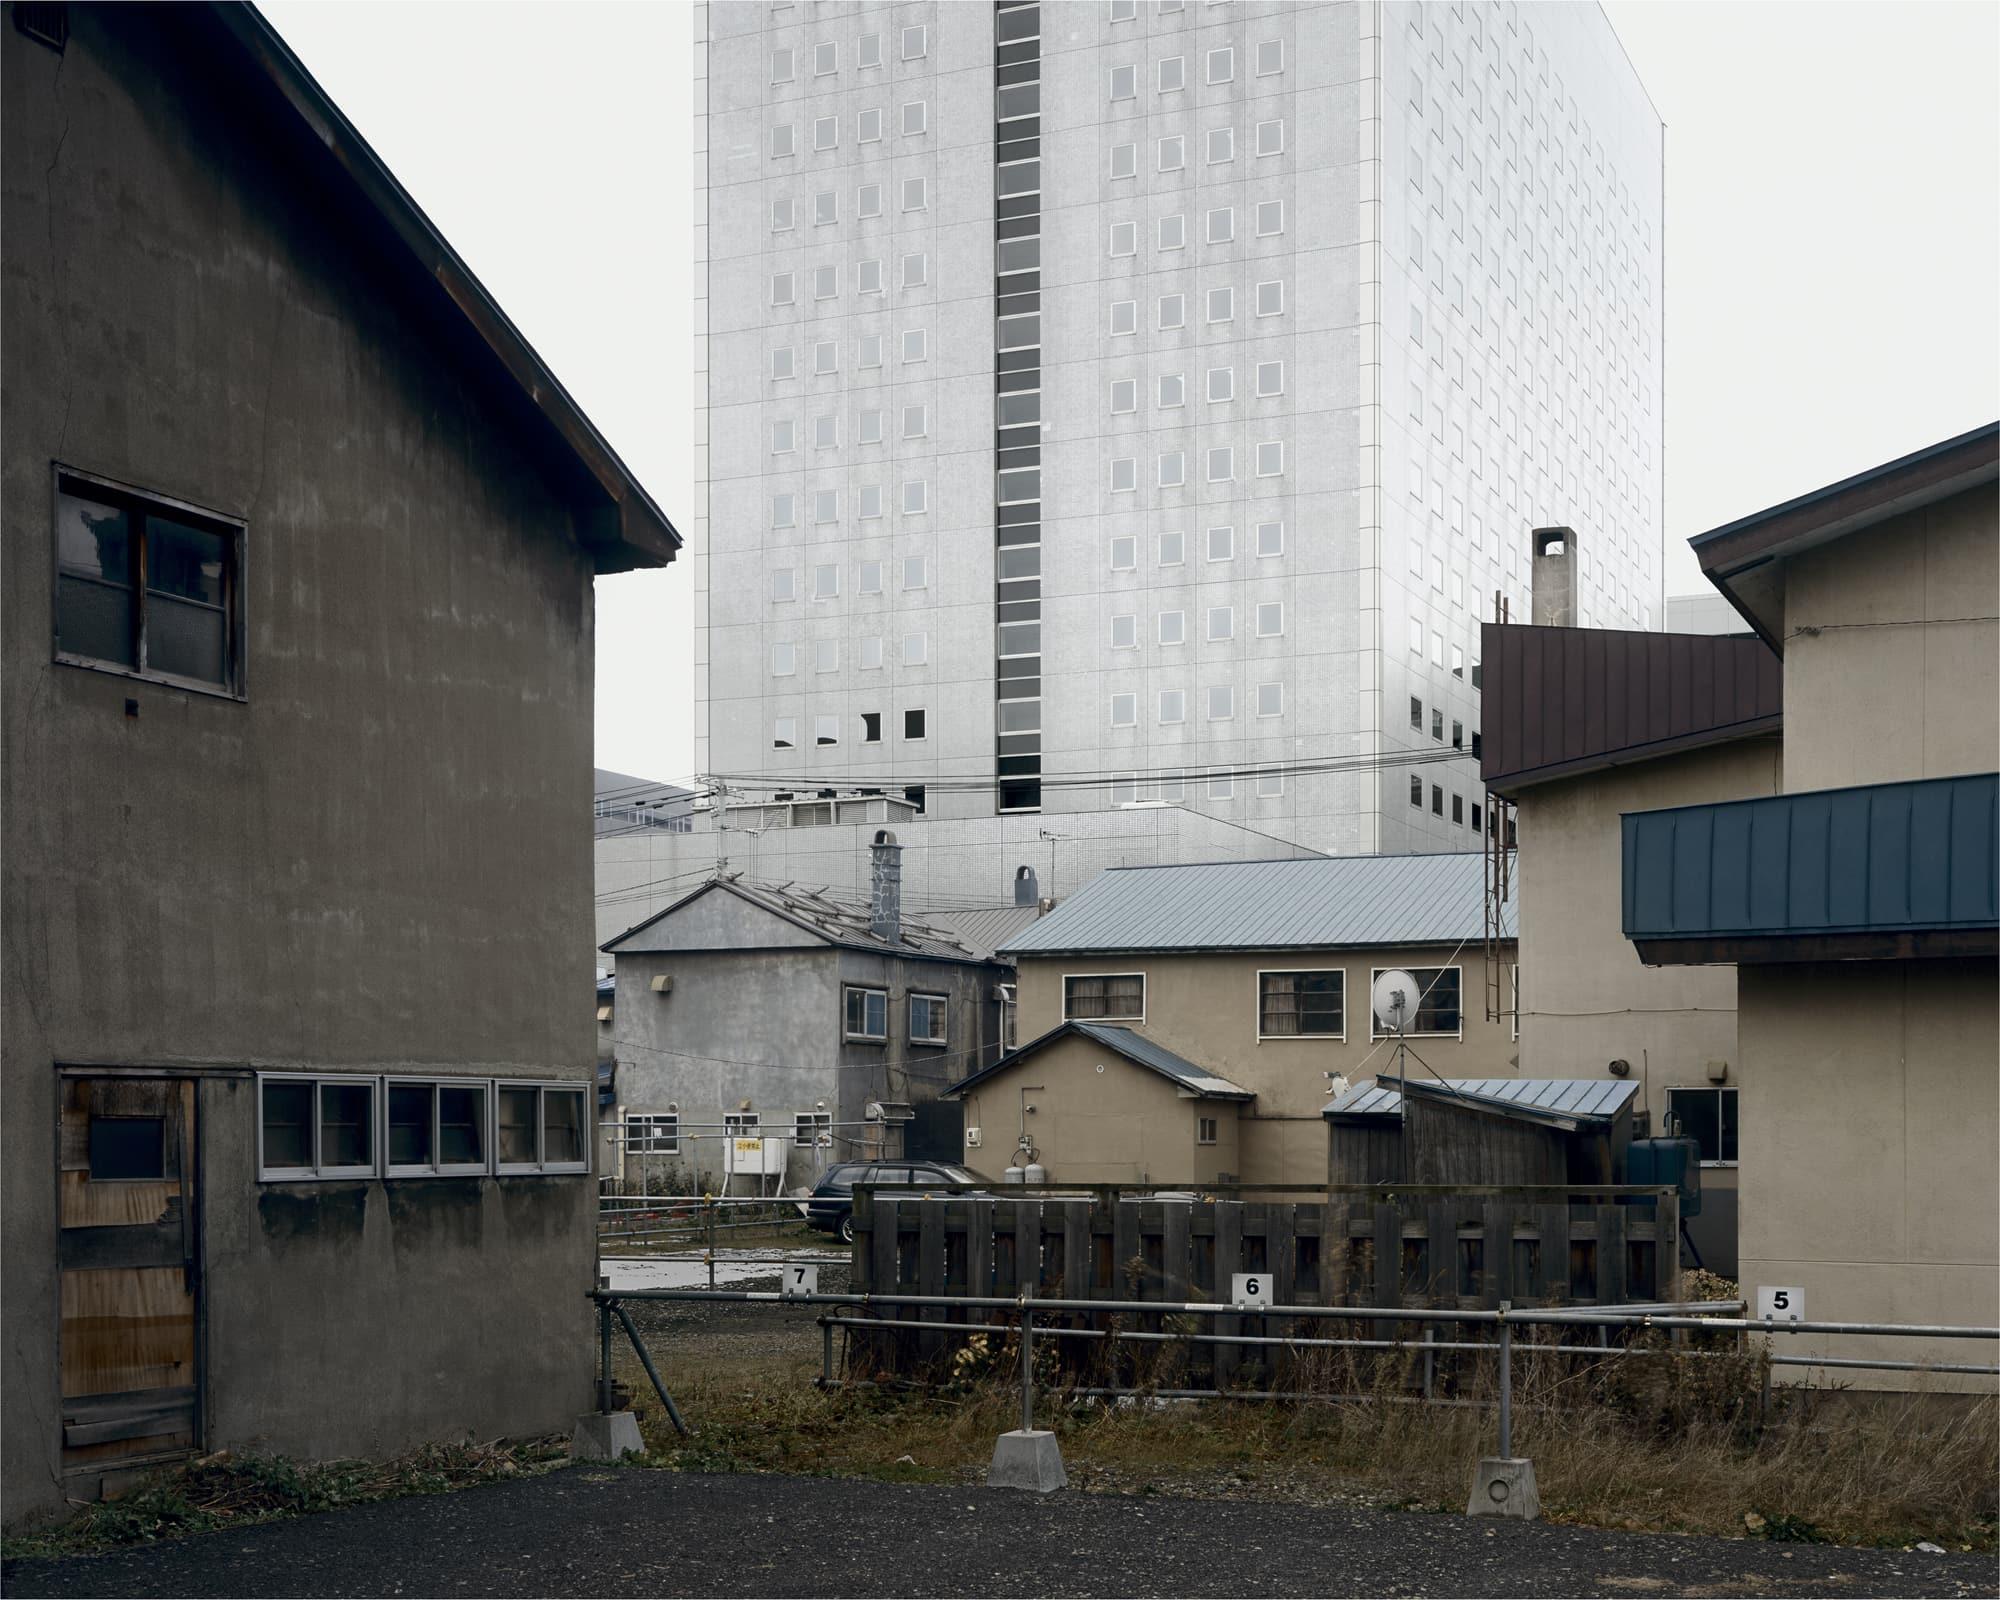 2017 SAPPORO ©︎ Keizo Kitajima